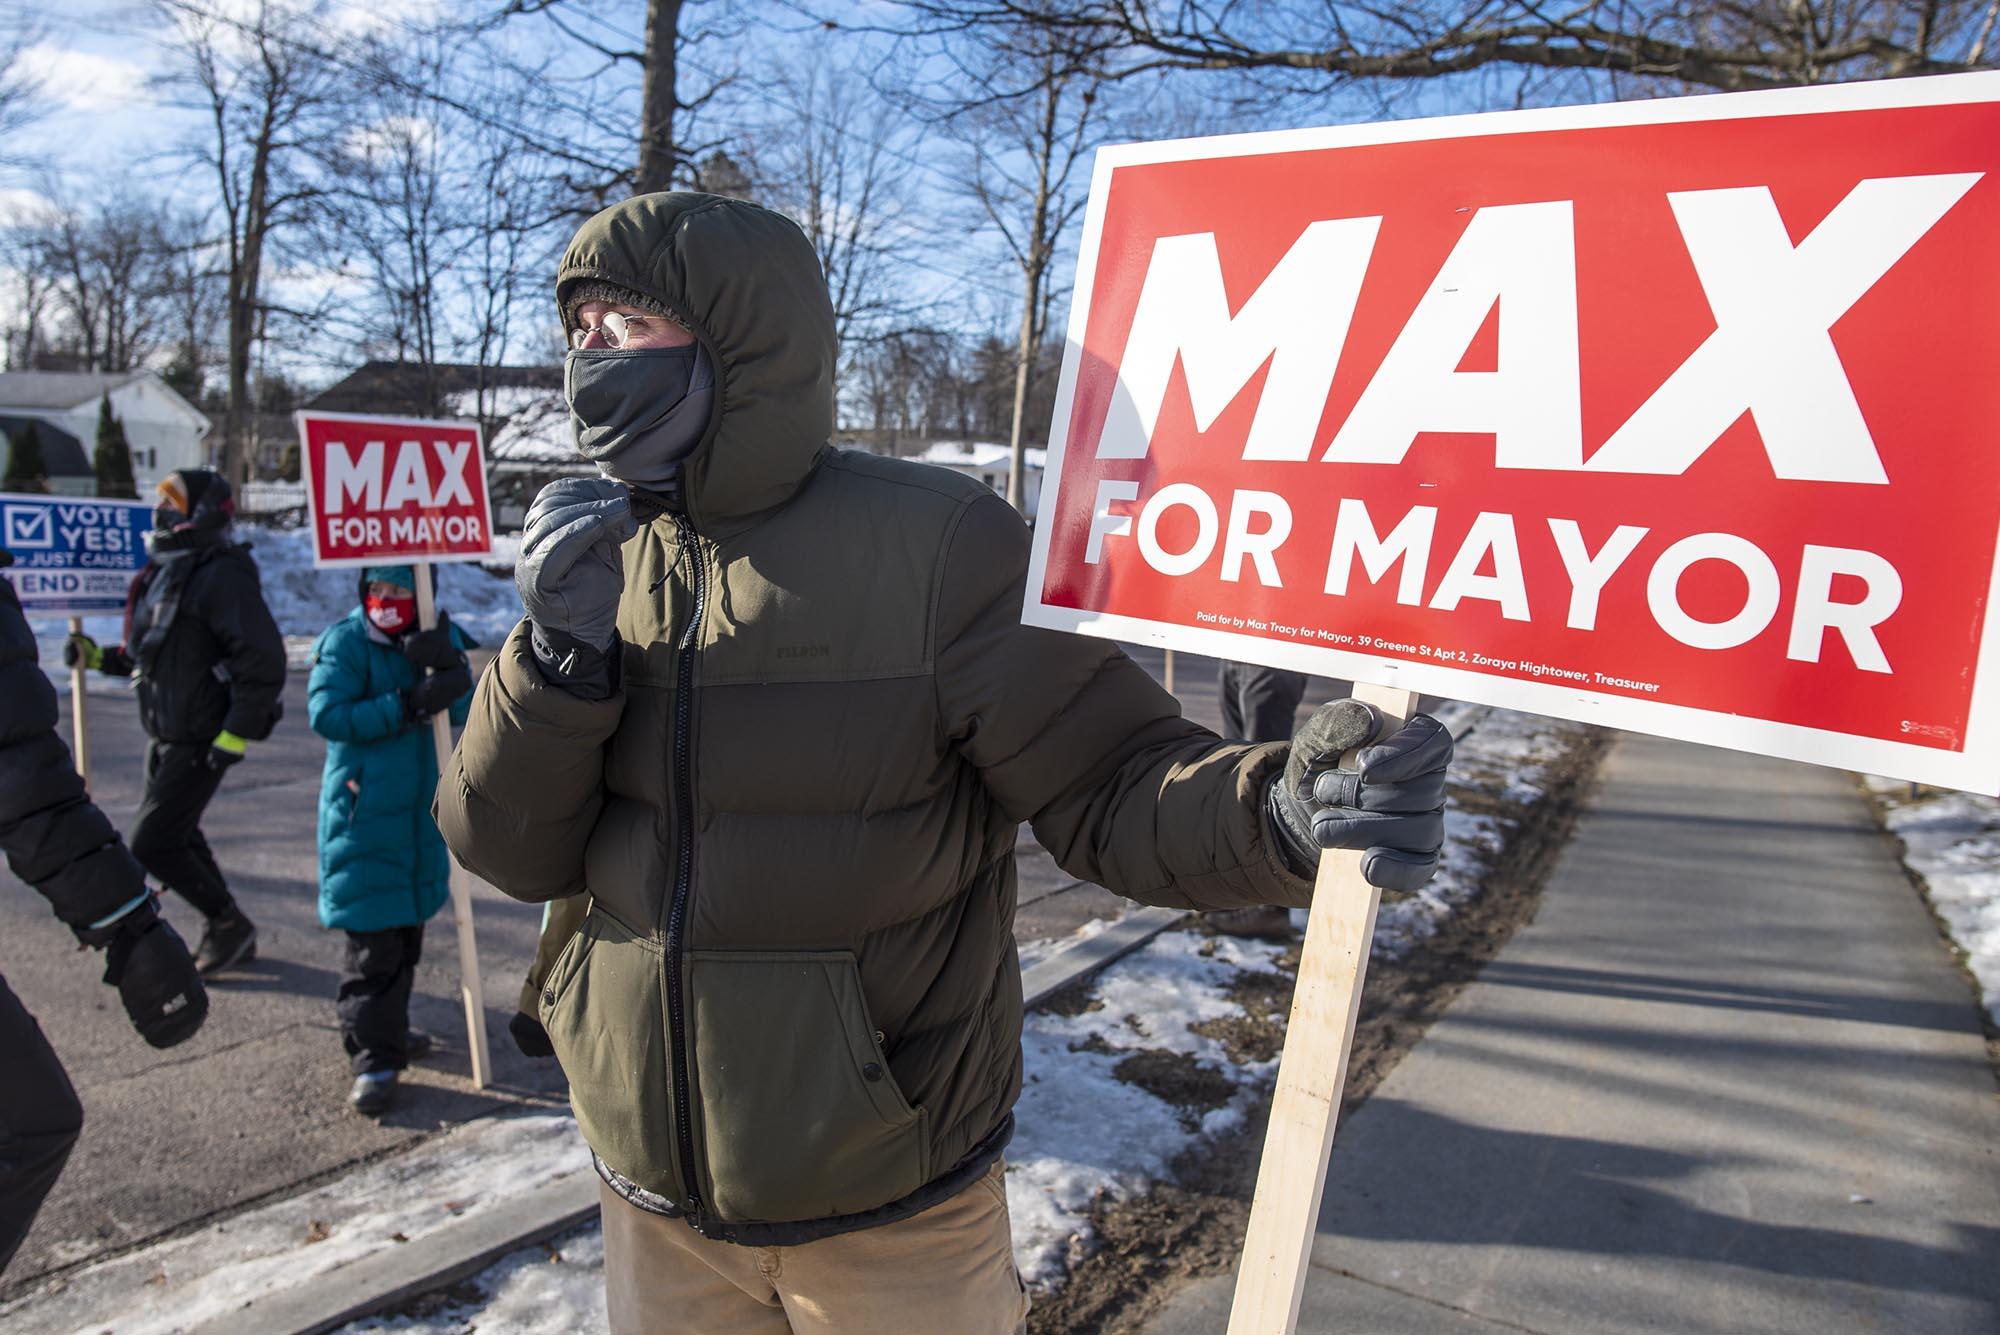 In mayor's race defined by Covid, a Progressive pitch for change fell short